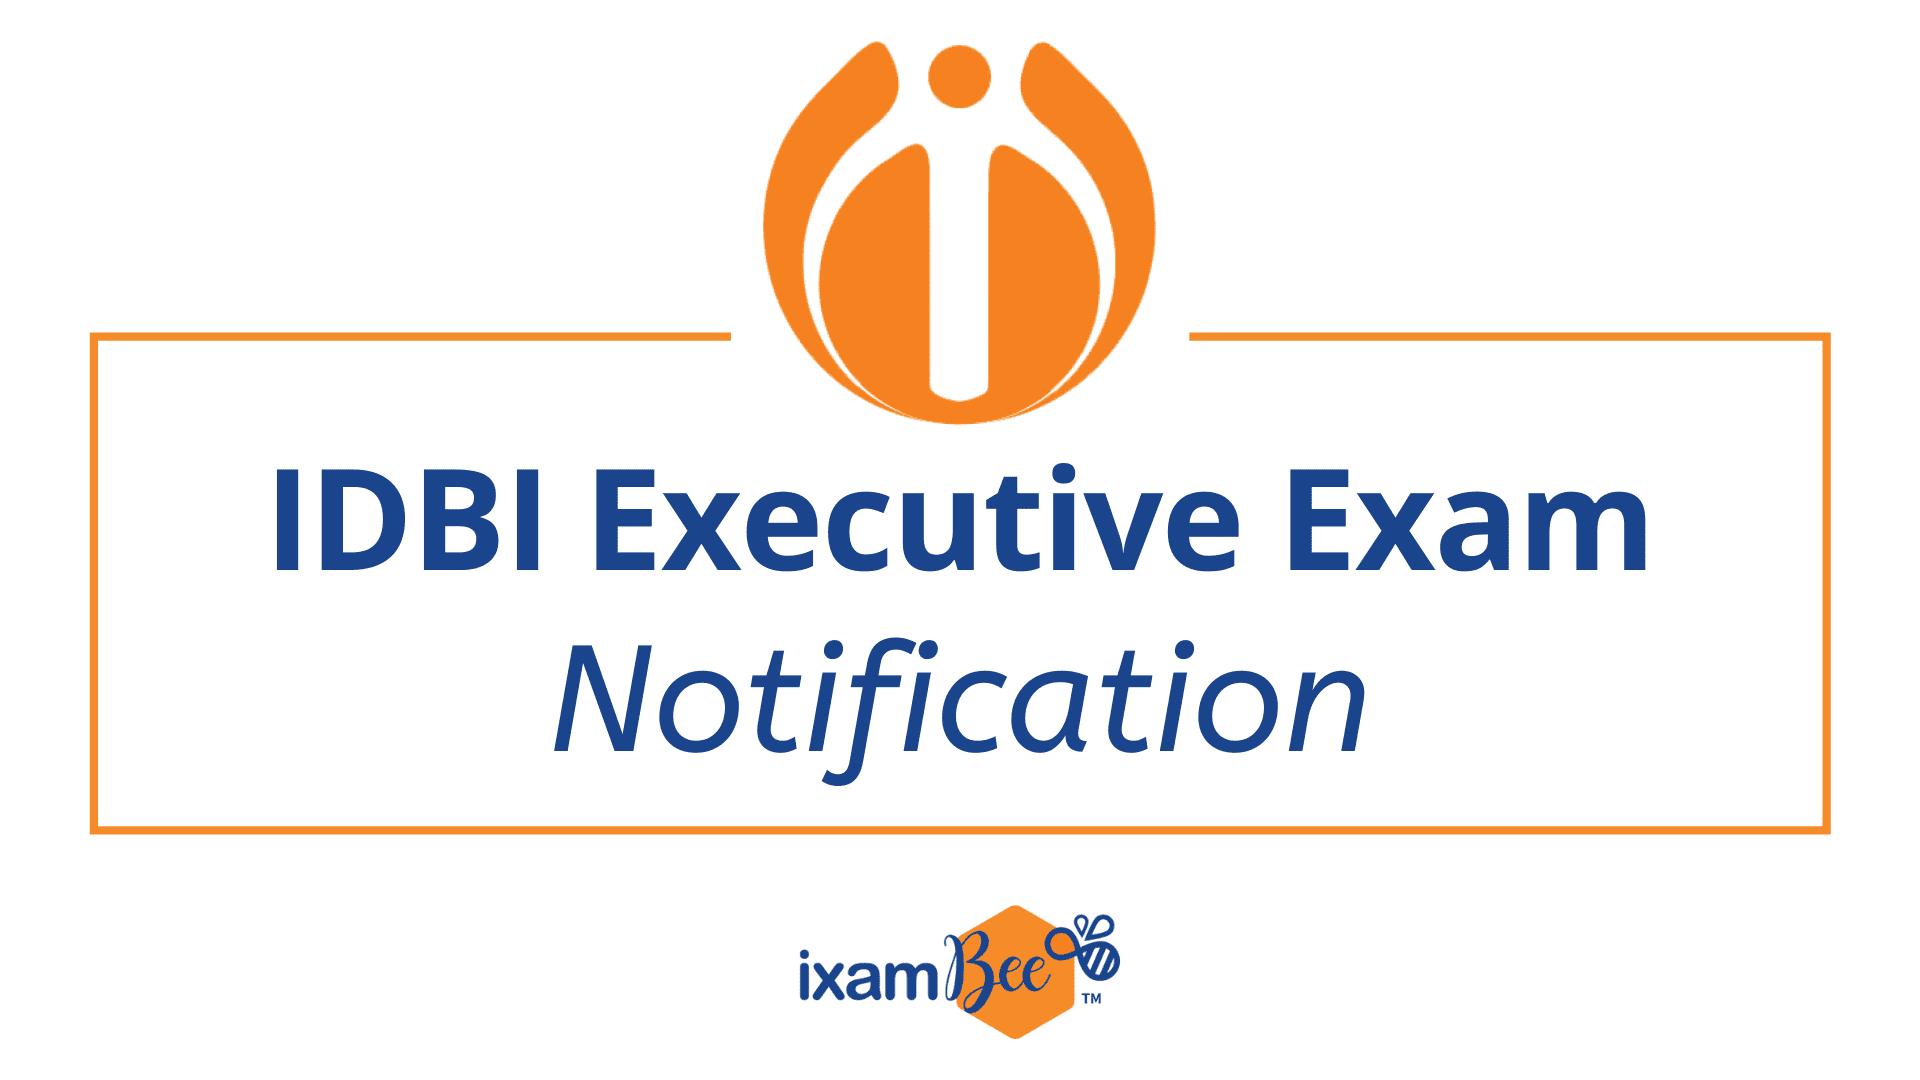 IDBI Executive Exam Notification